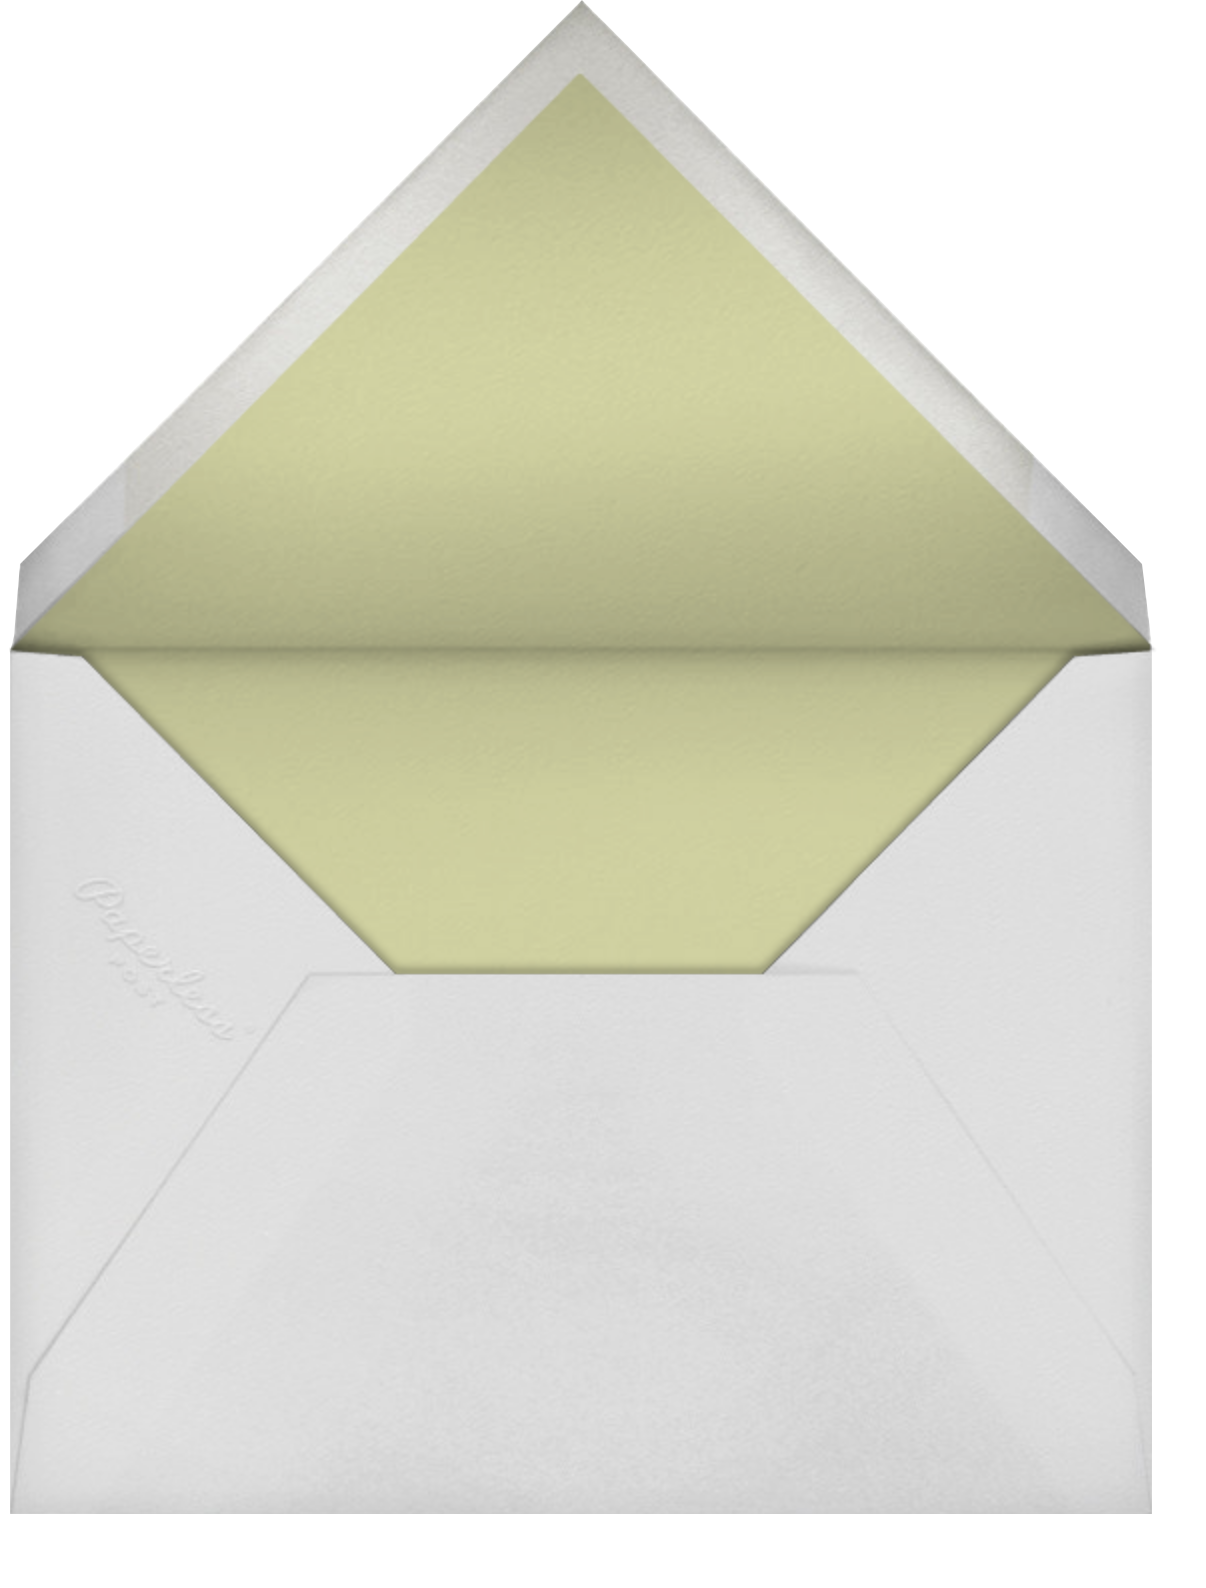 Saranac (Thank You) - Celery - Crane & Co. - null - envelope back